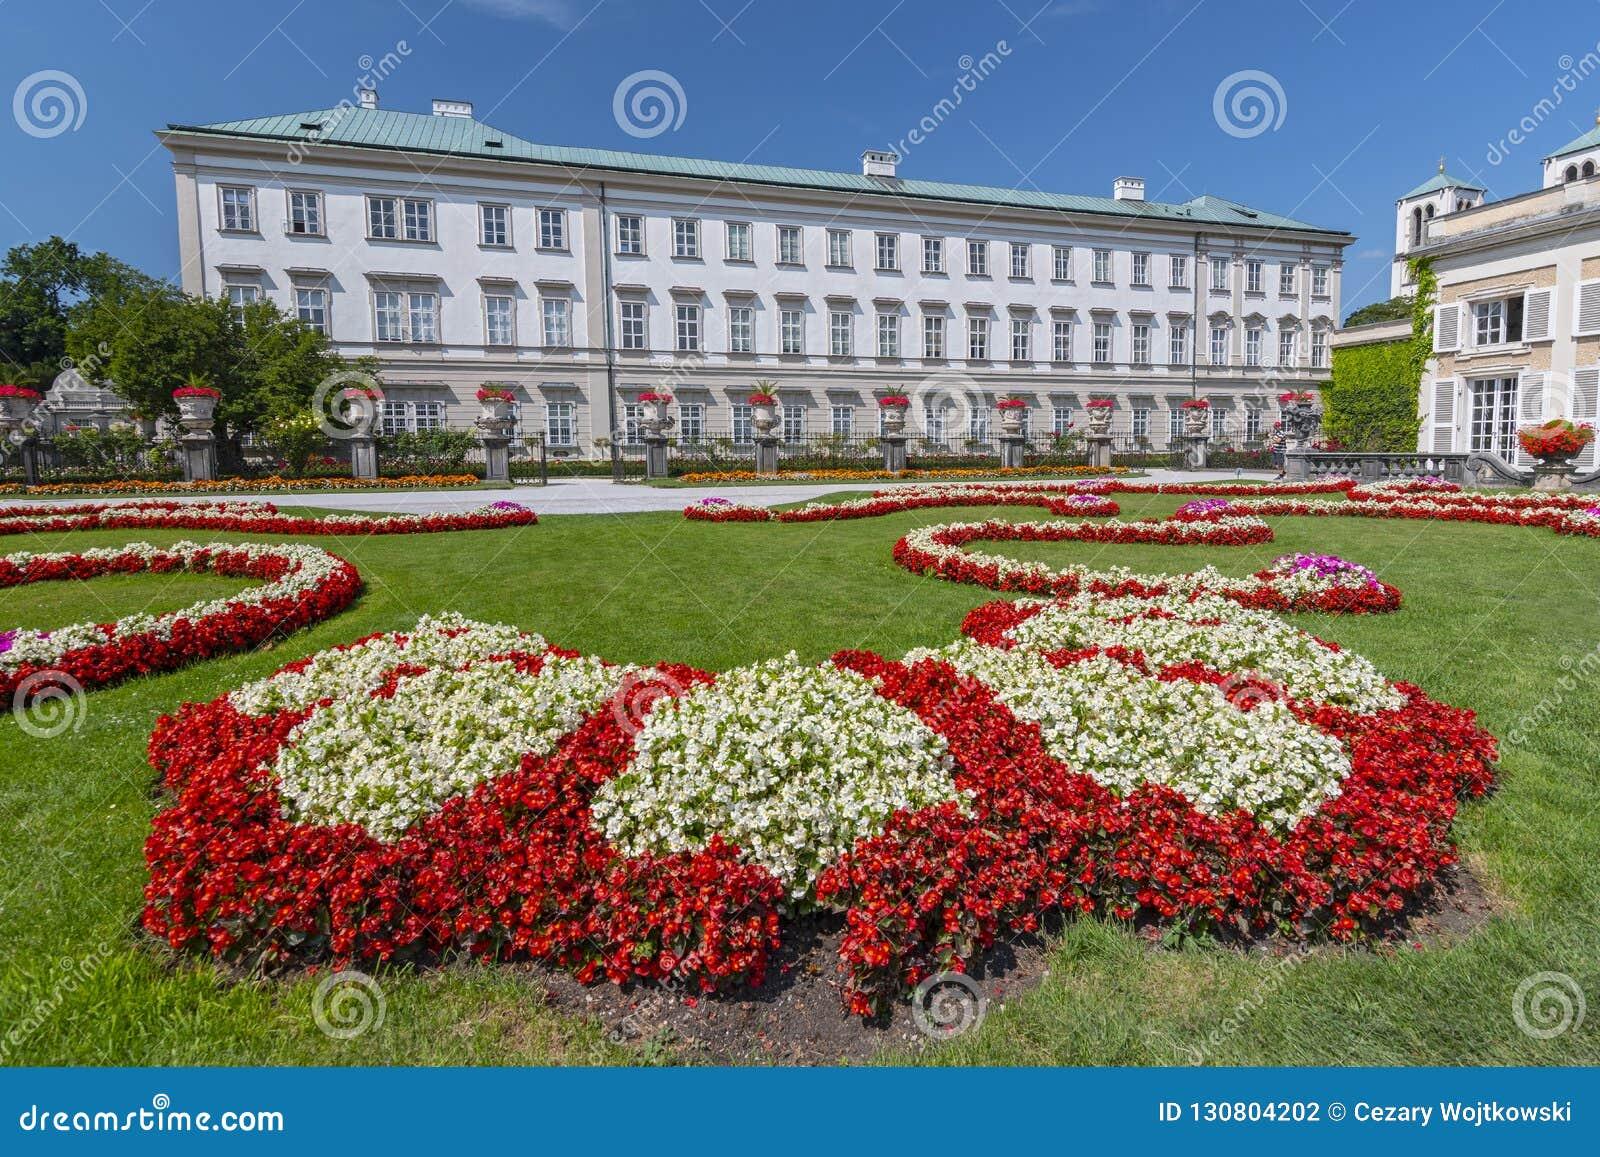 Сады Mirabell и дворец Mirabell, Зальцбург Австрия